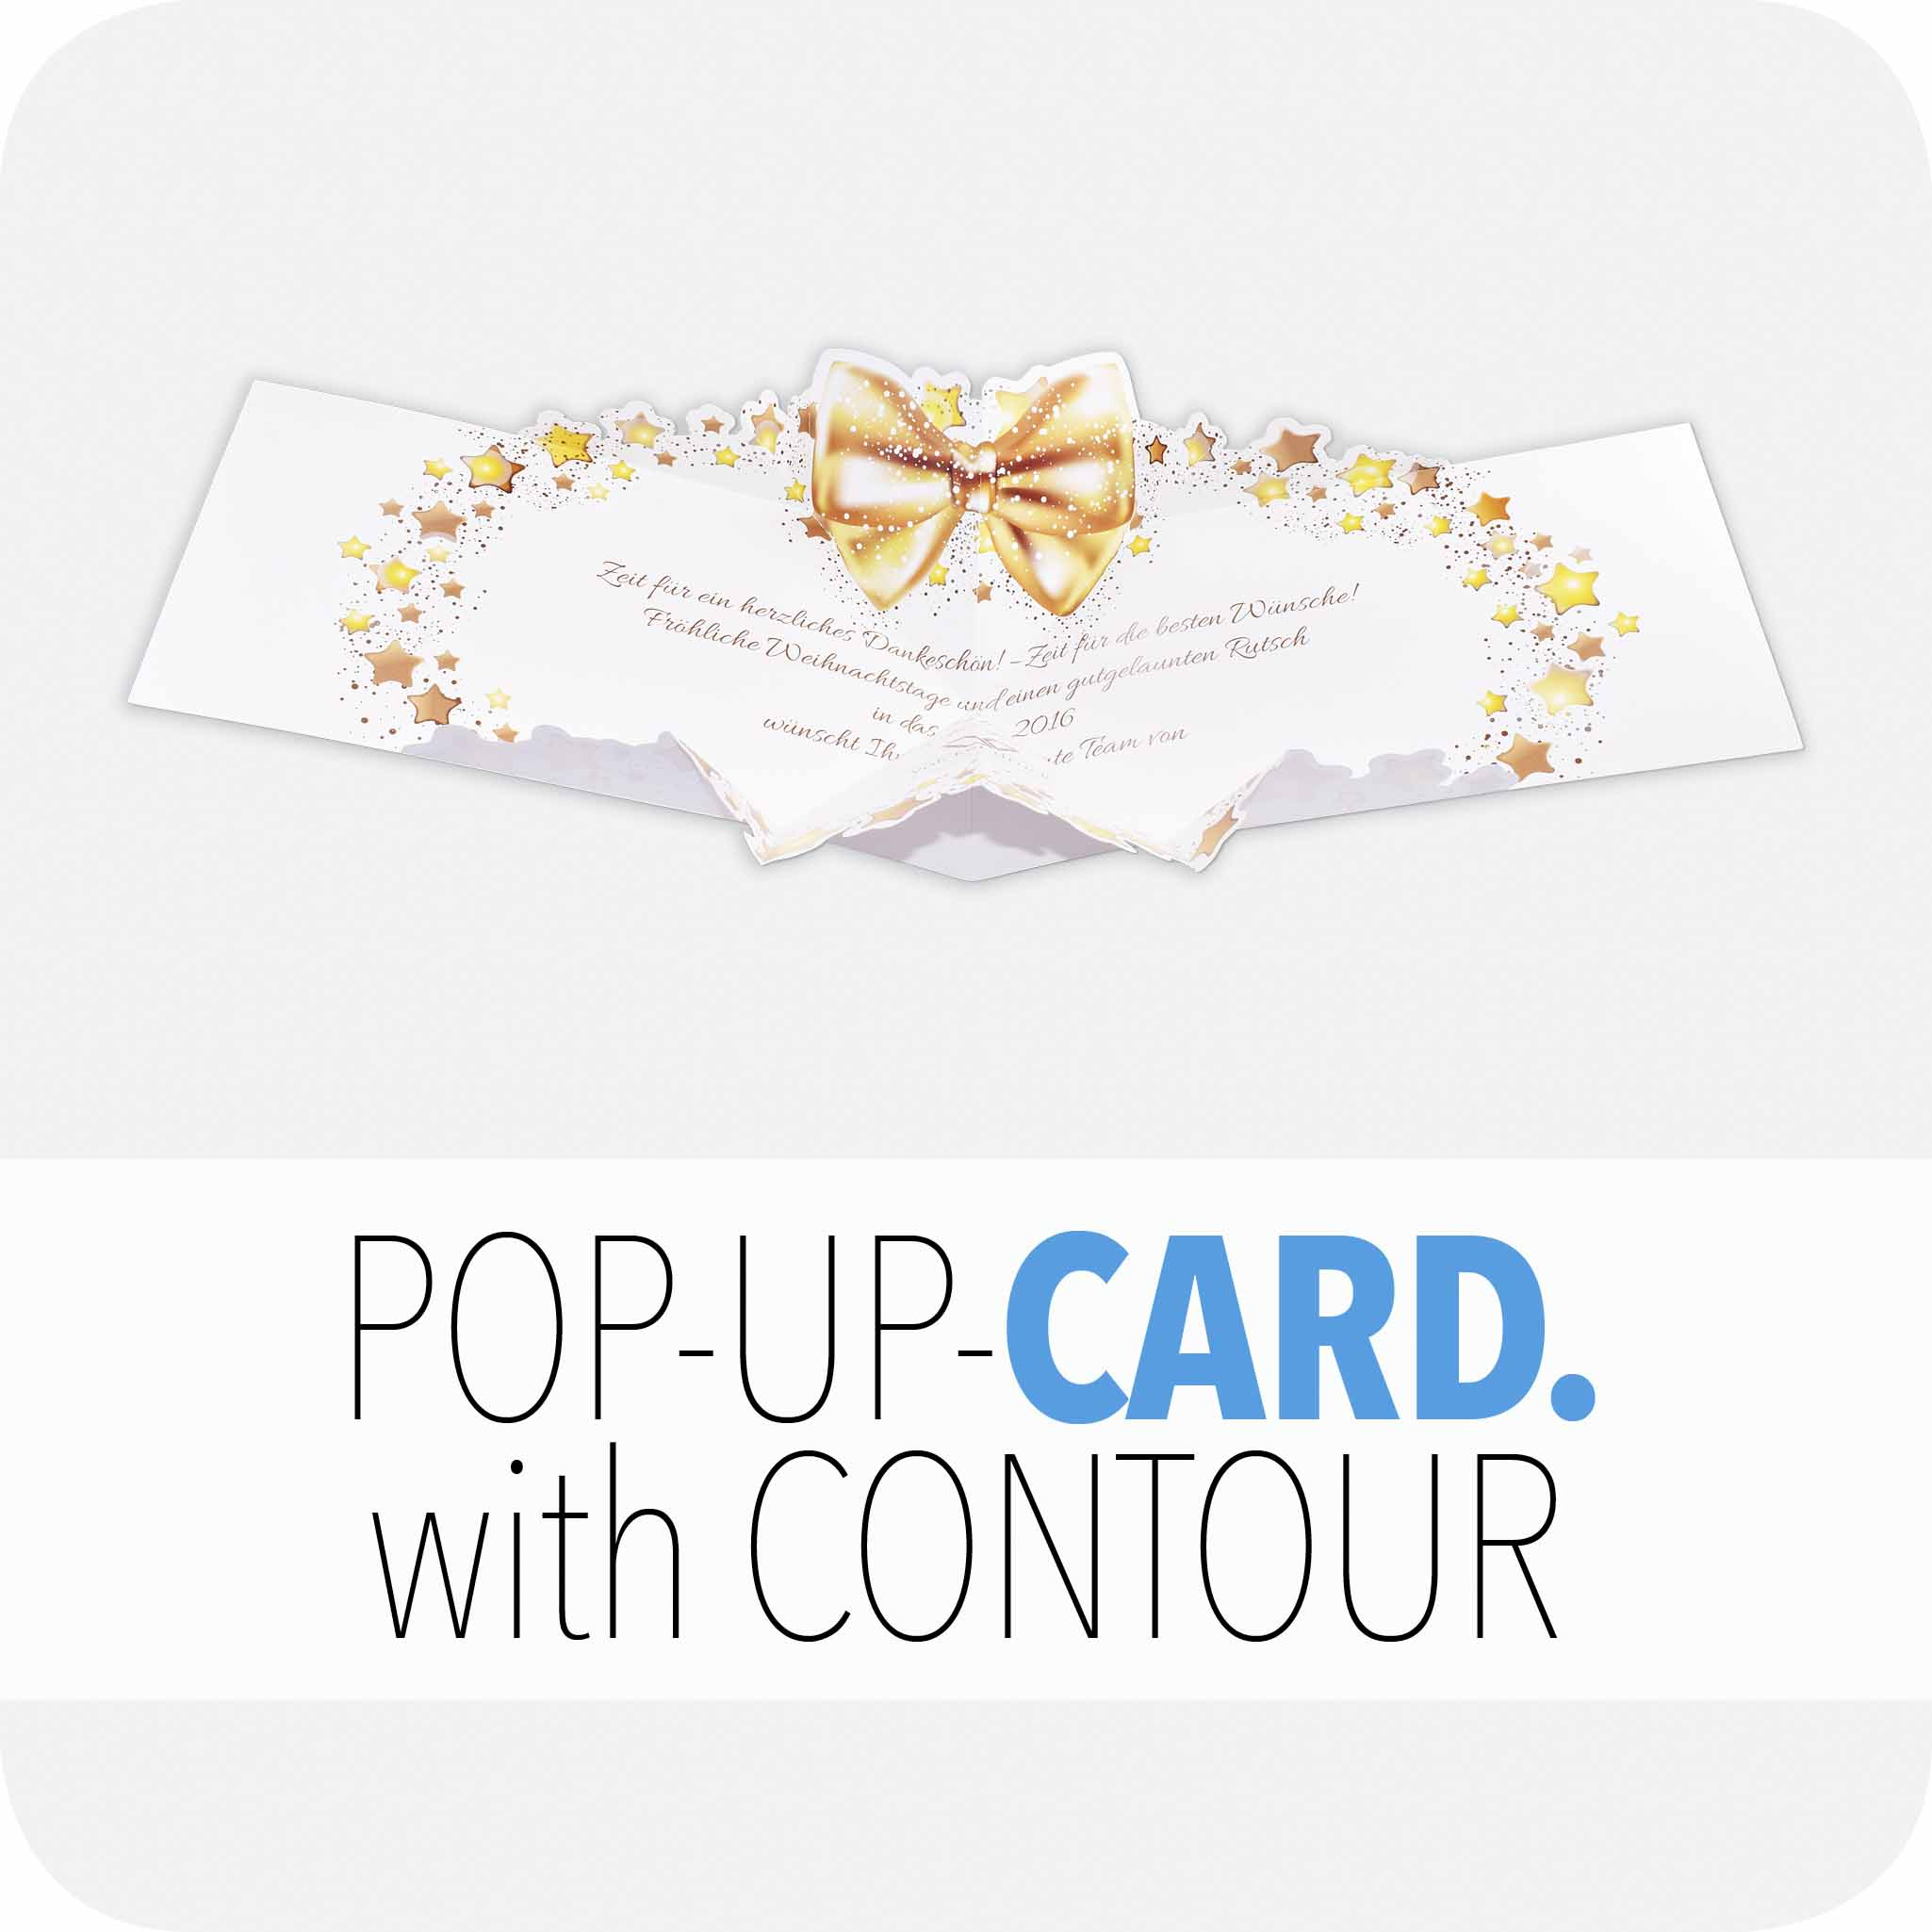 Pop-up card with contour